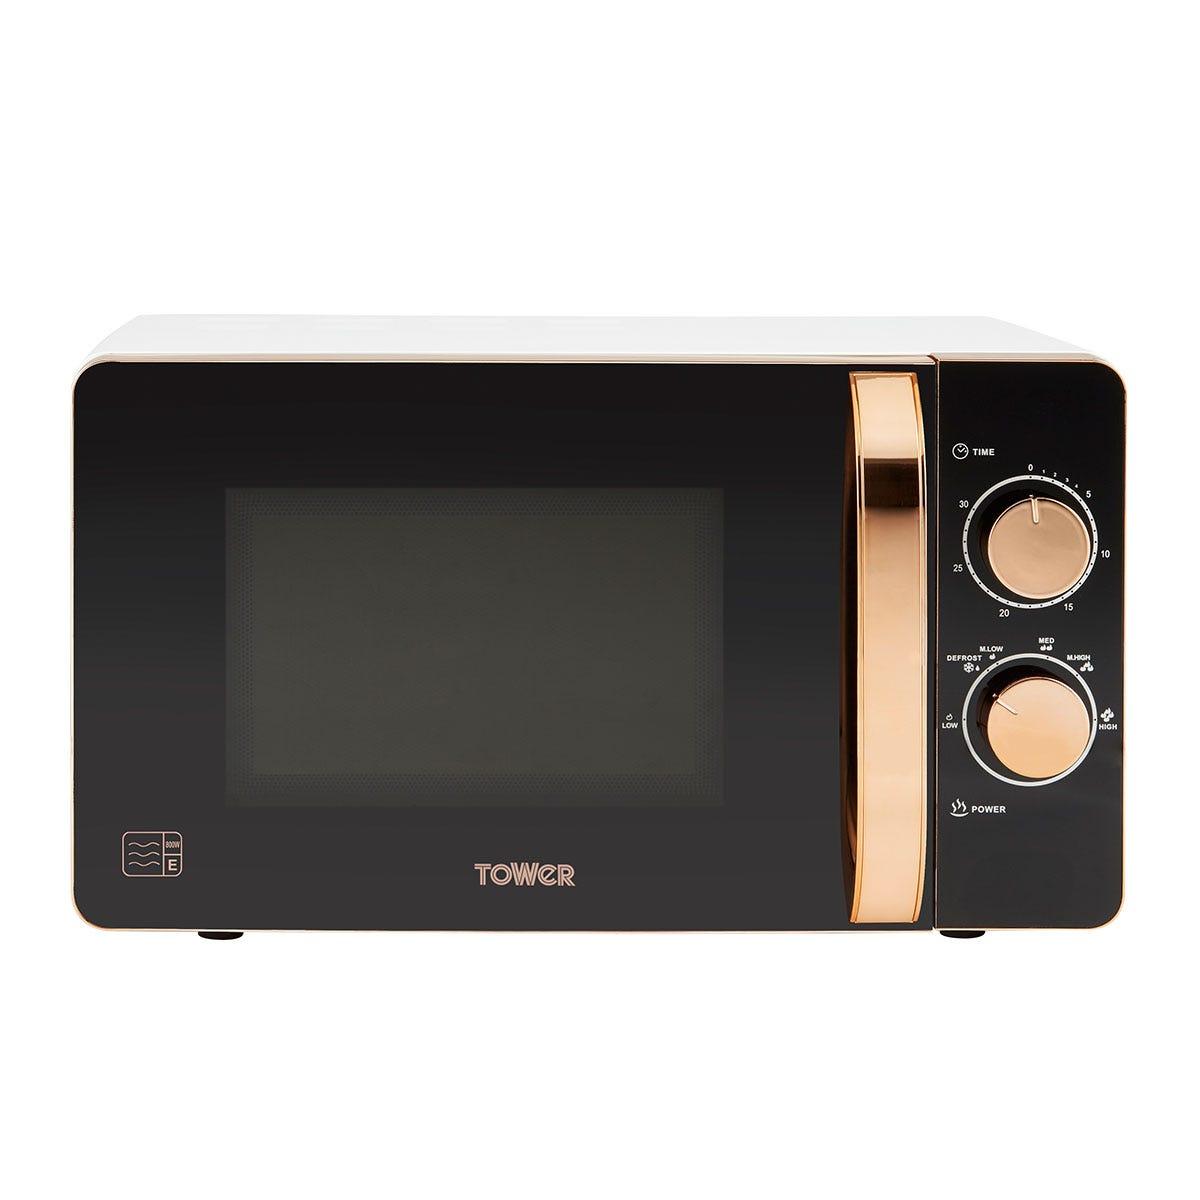 Tower T24020W 800W Manual 20L Microwave - White/Black/Pink